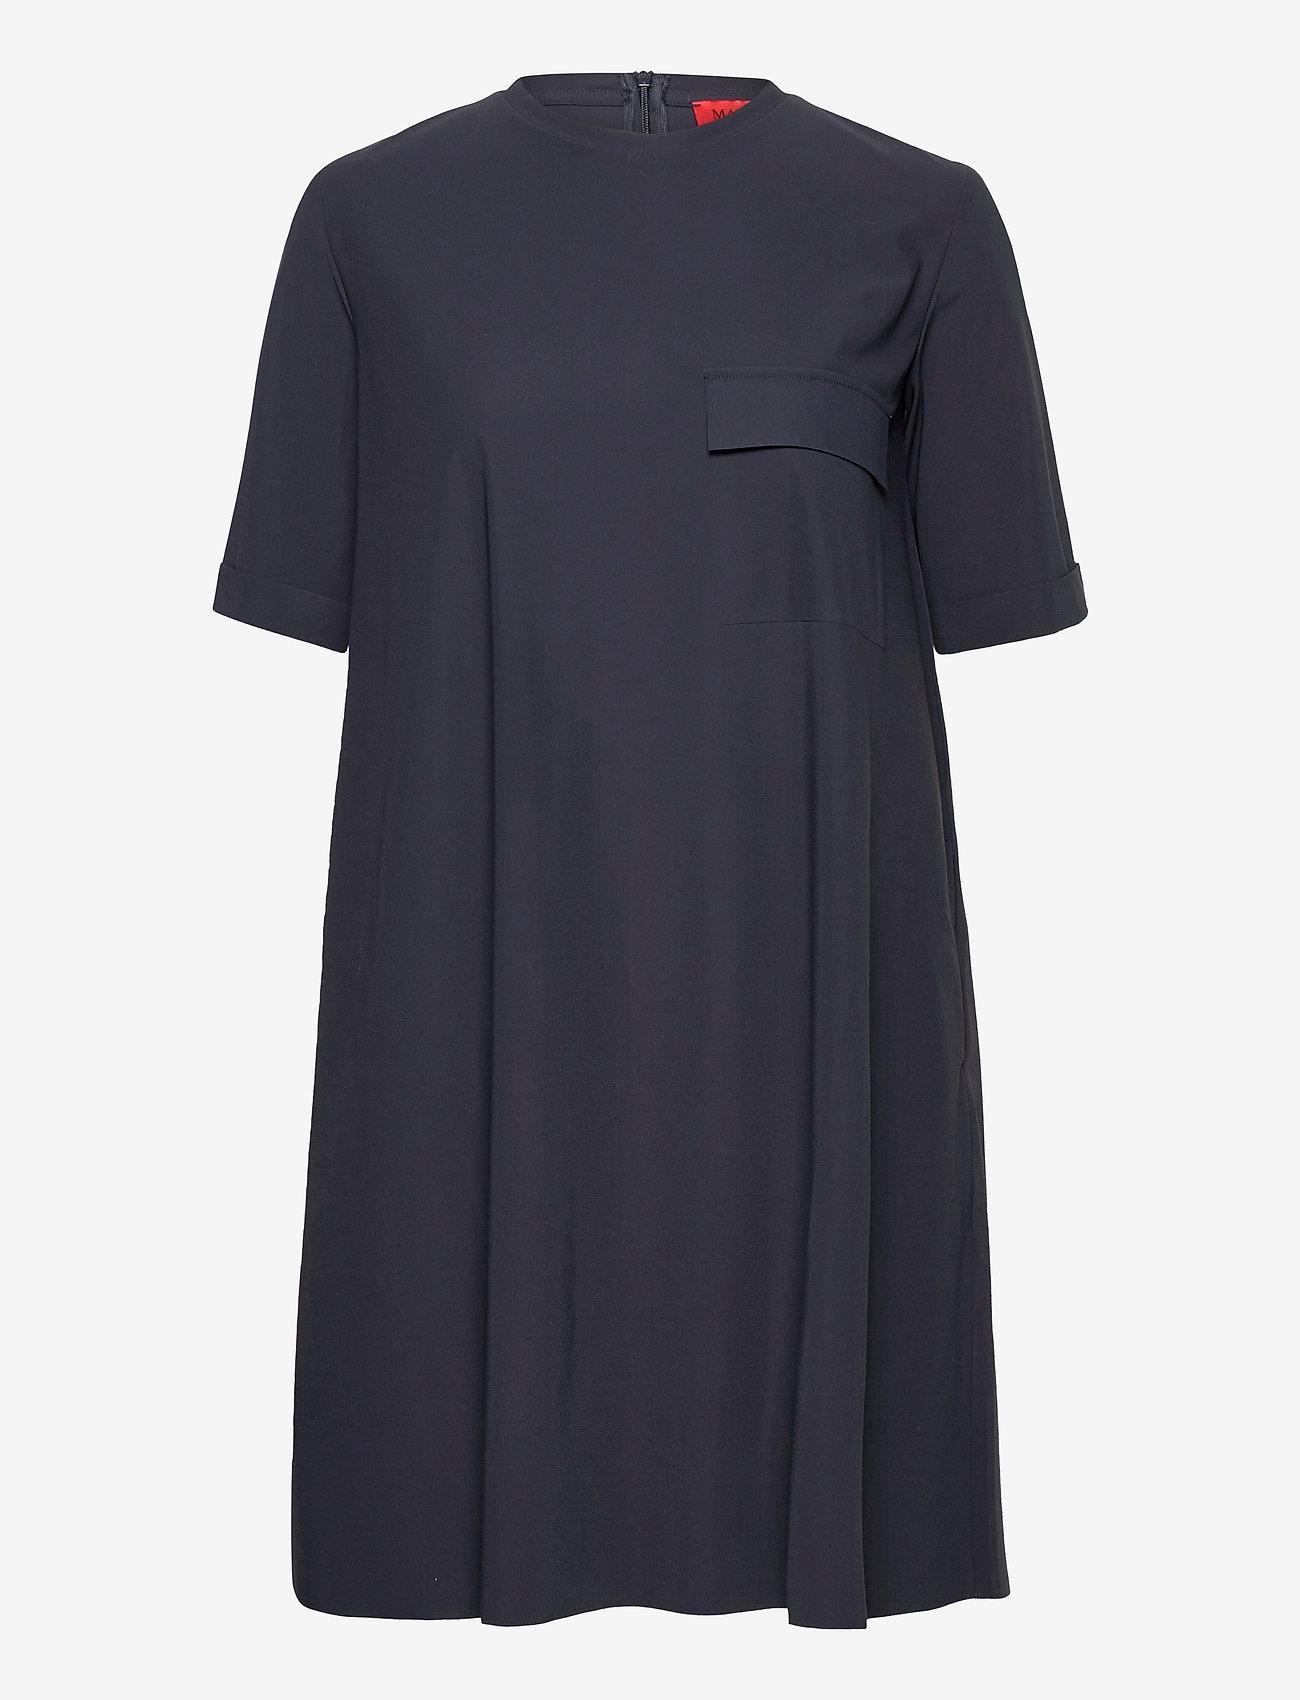 Max&Co. - CRONACA - alledaagse jurken - navy blue - 0